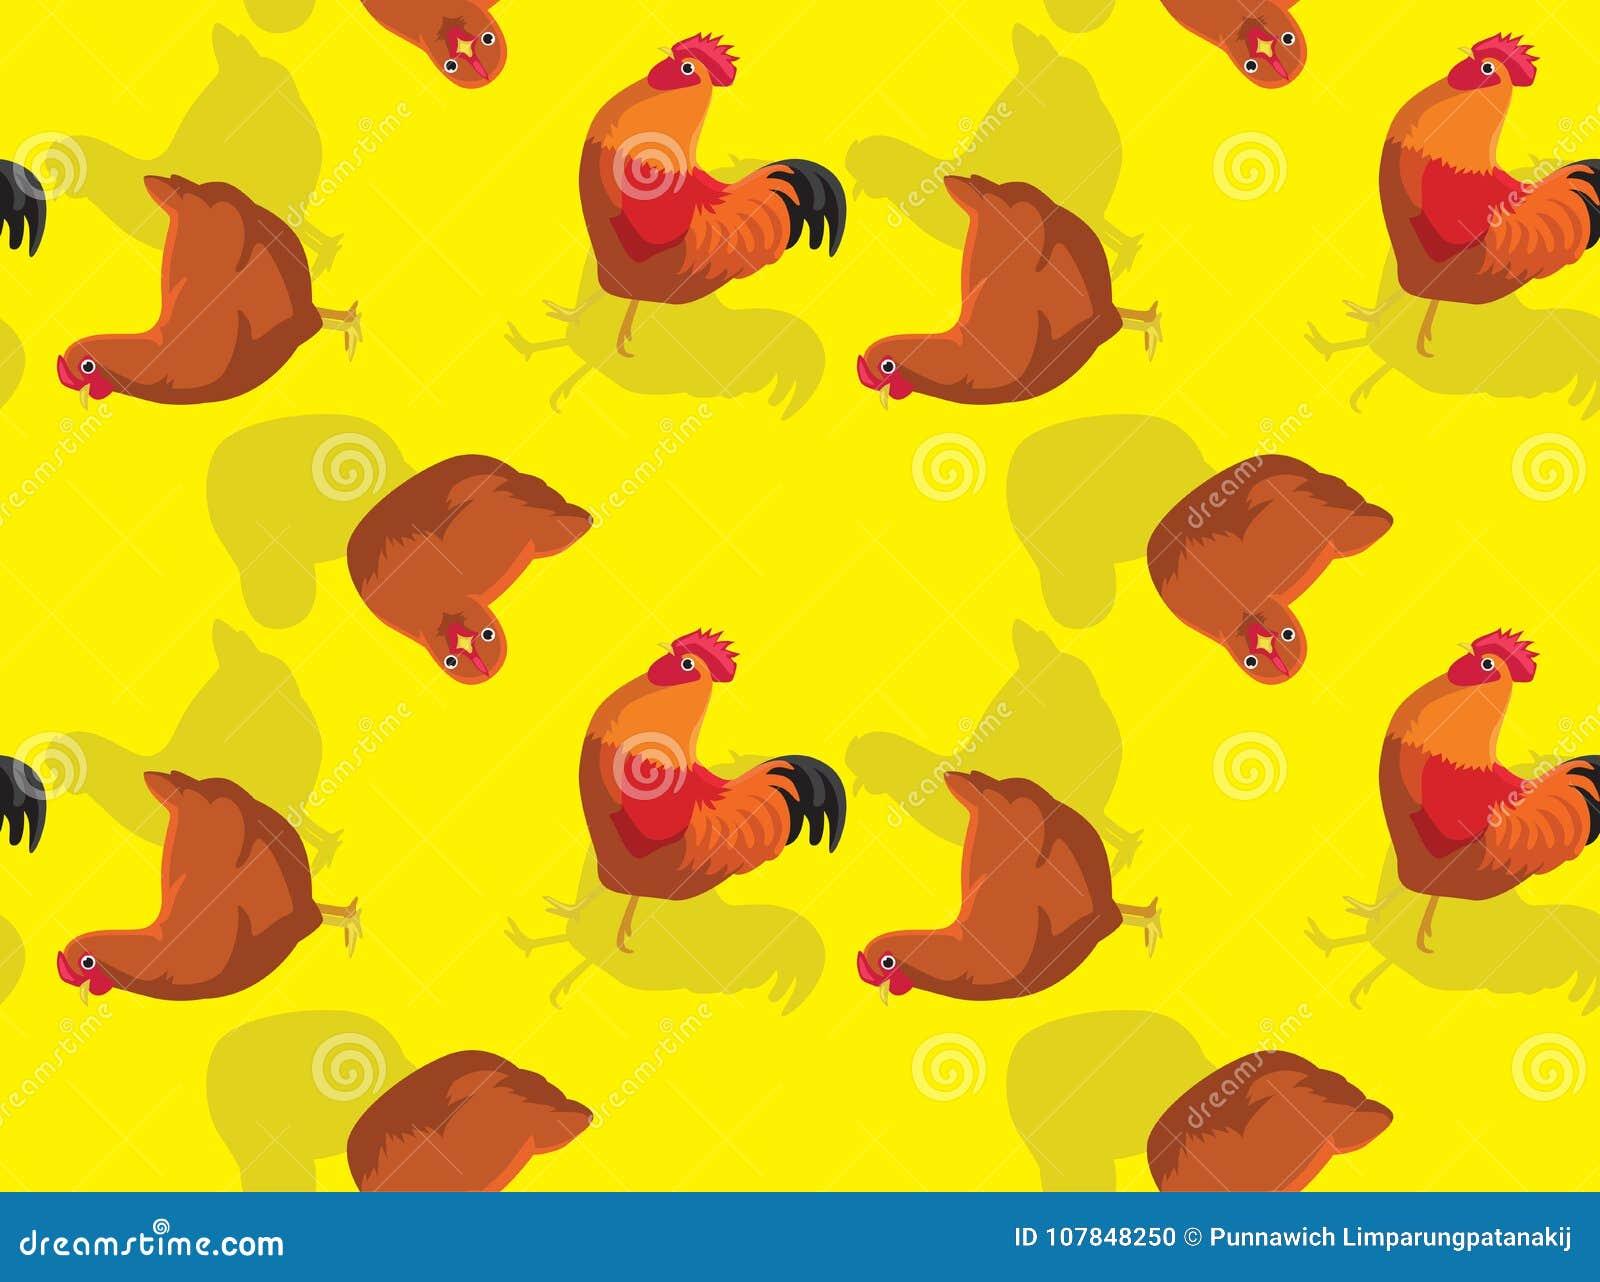 Chicken New Hampshire Red Cartoon Seamless Wallpaper Stock